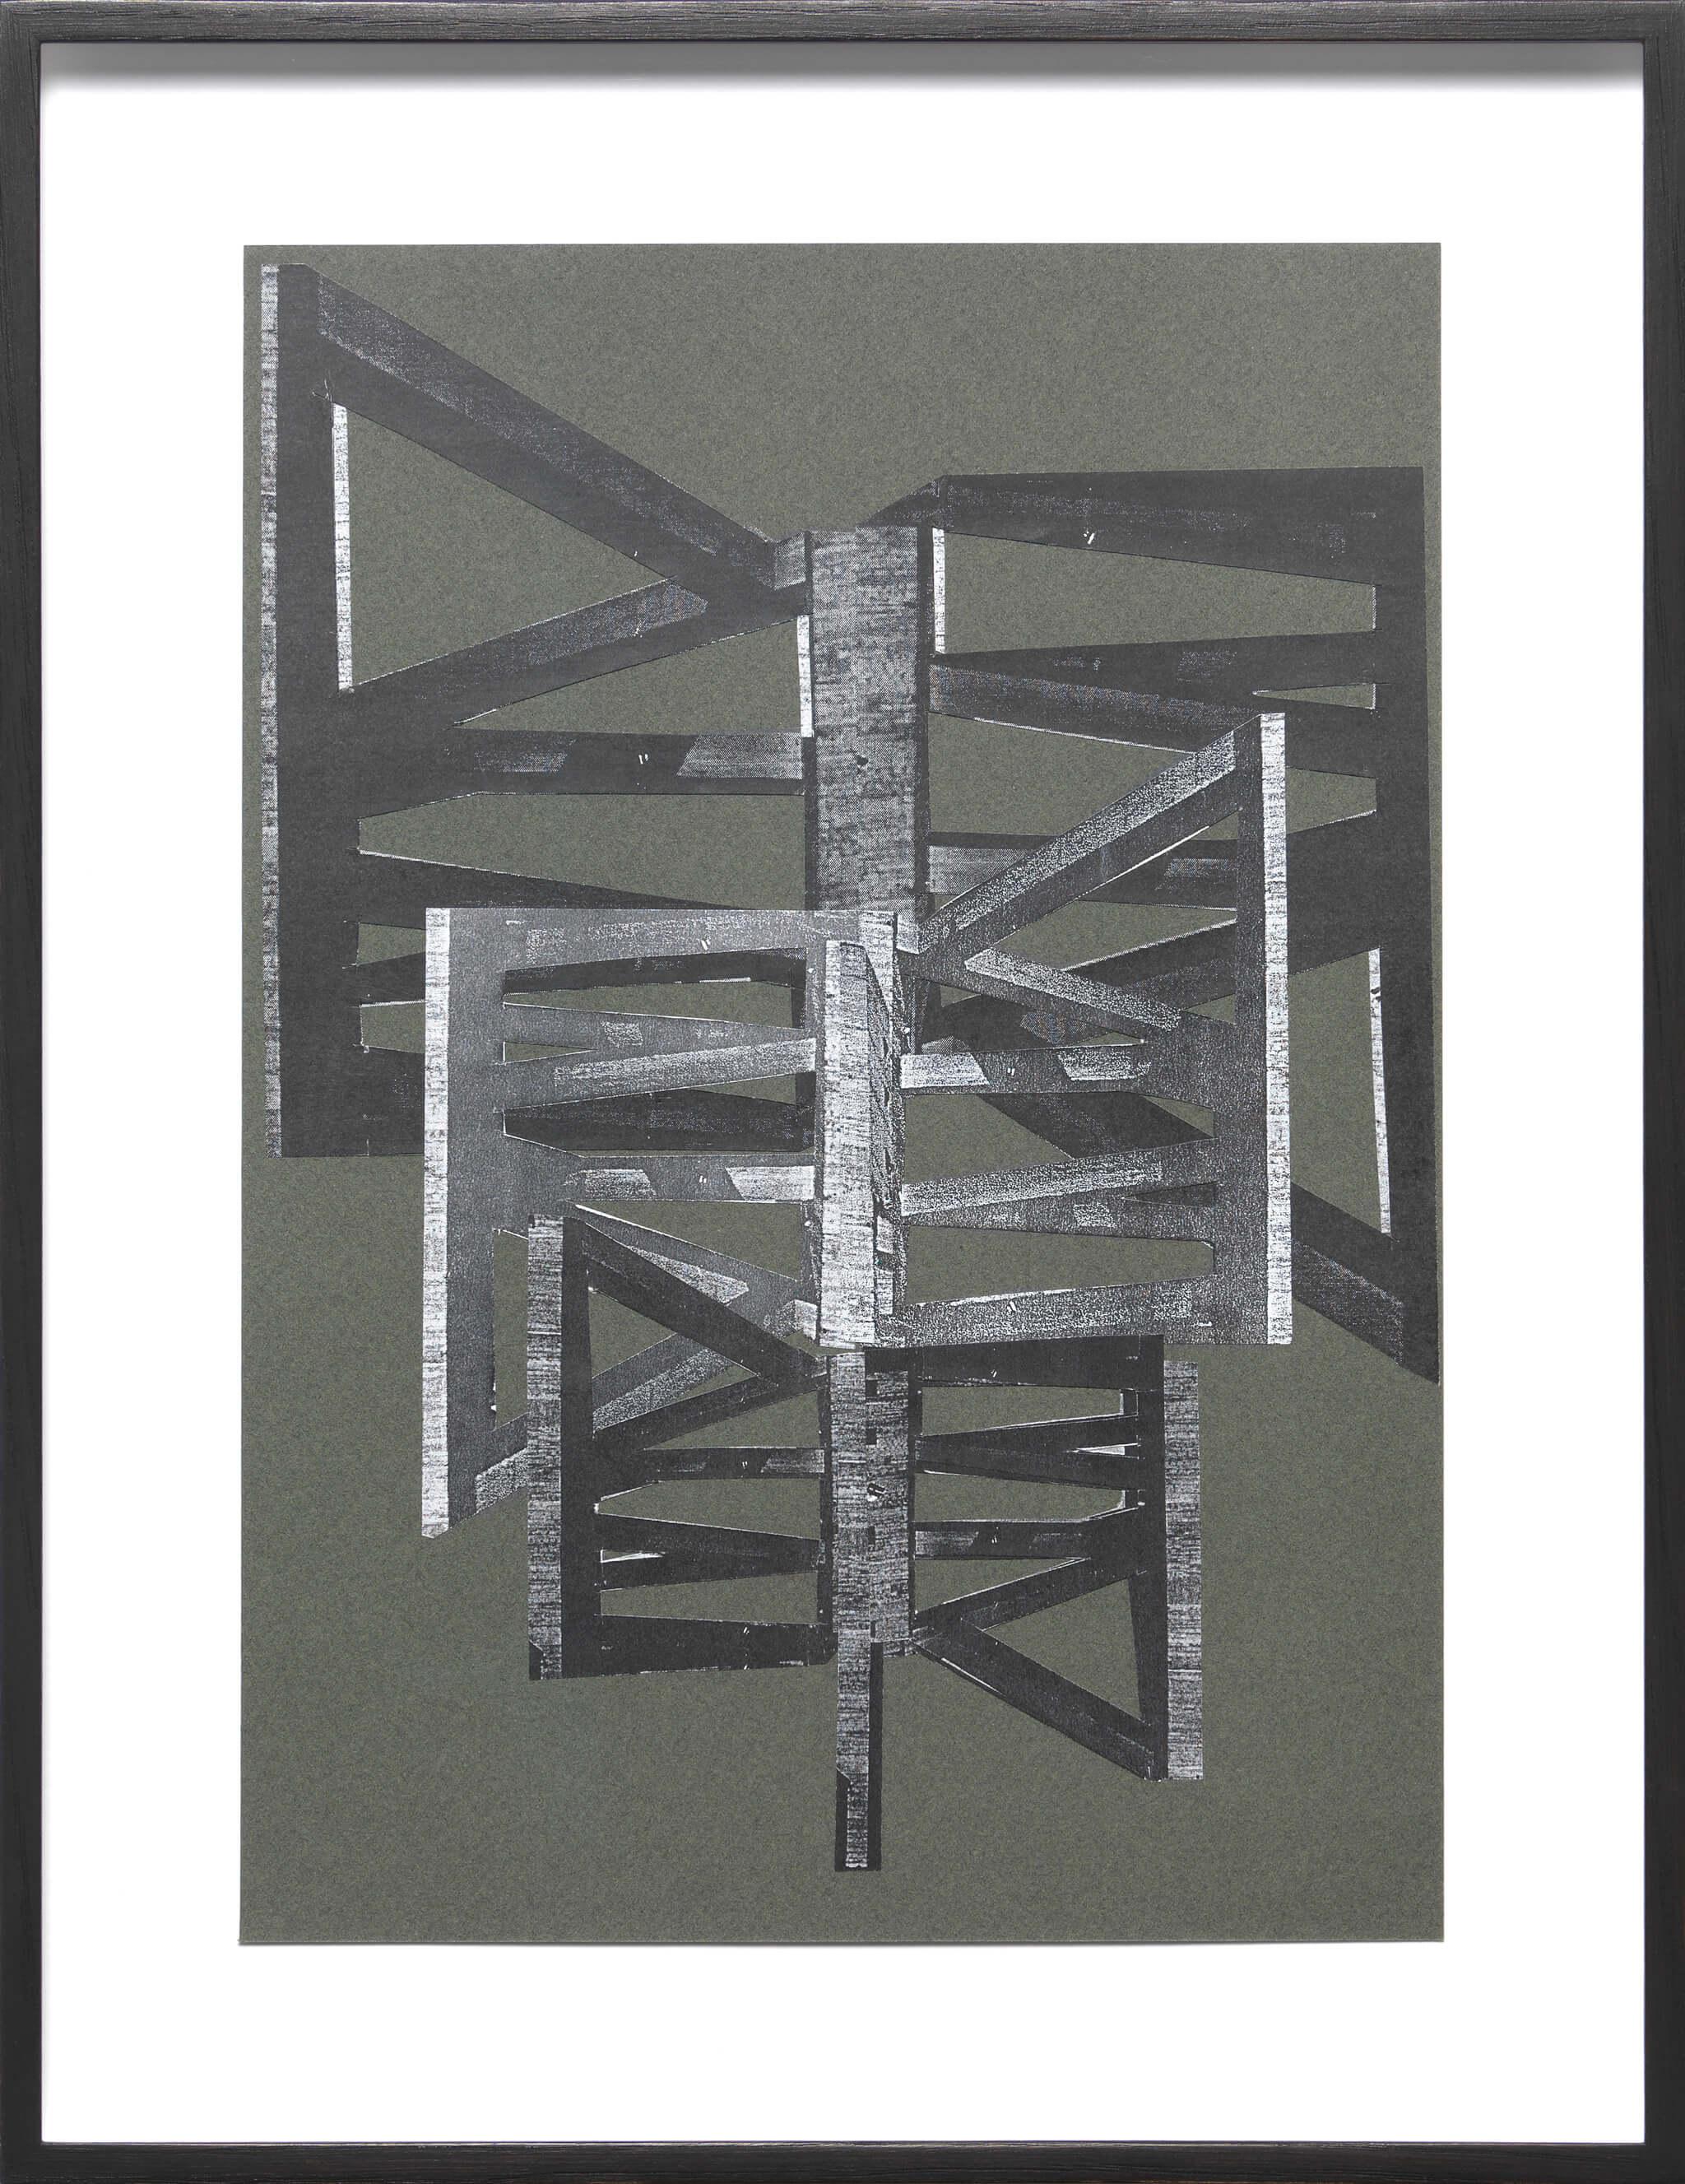 85_Frauke-Dannert_Collage_Papiercollage_Propeller_2015